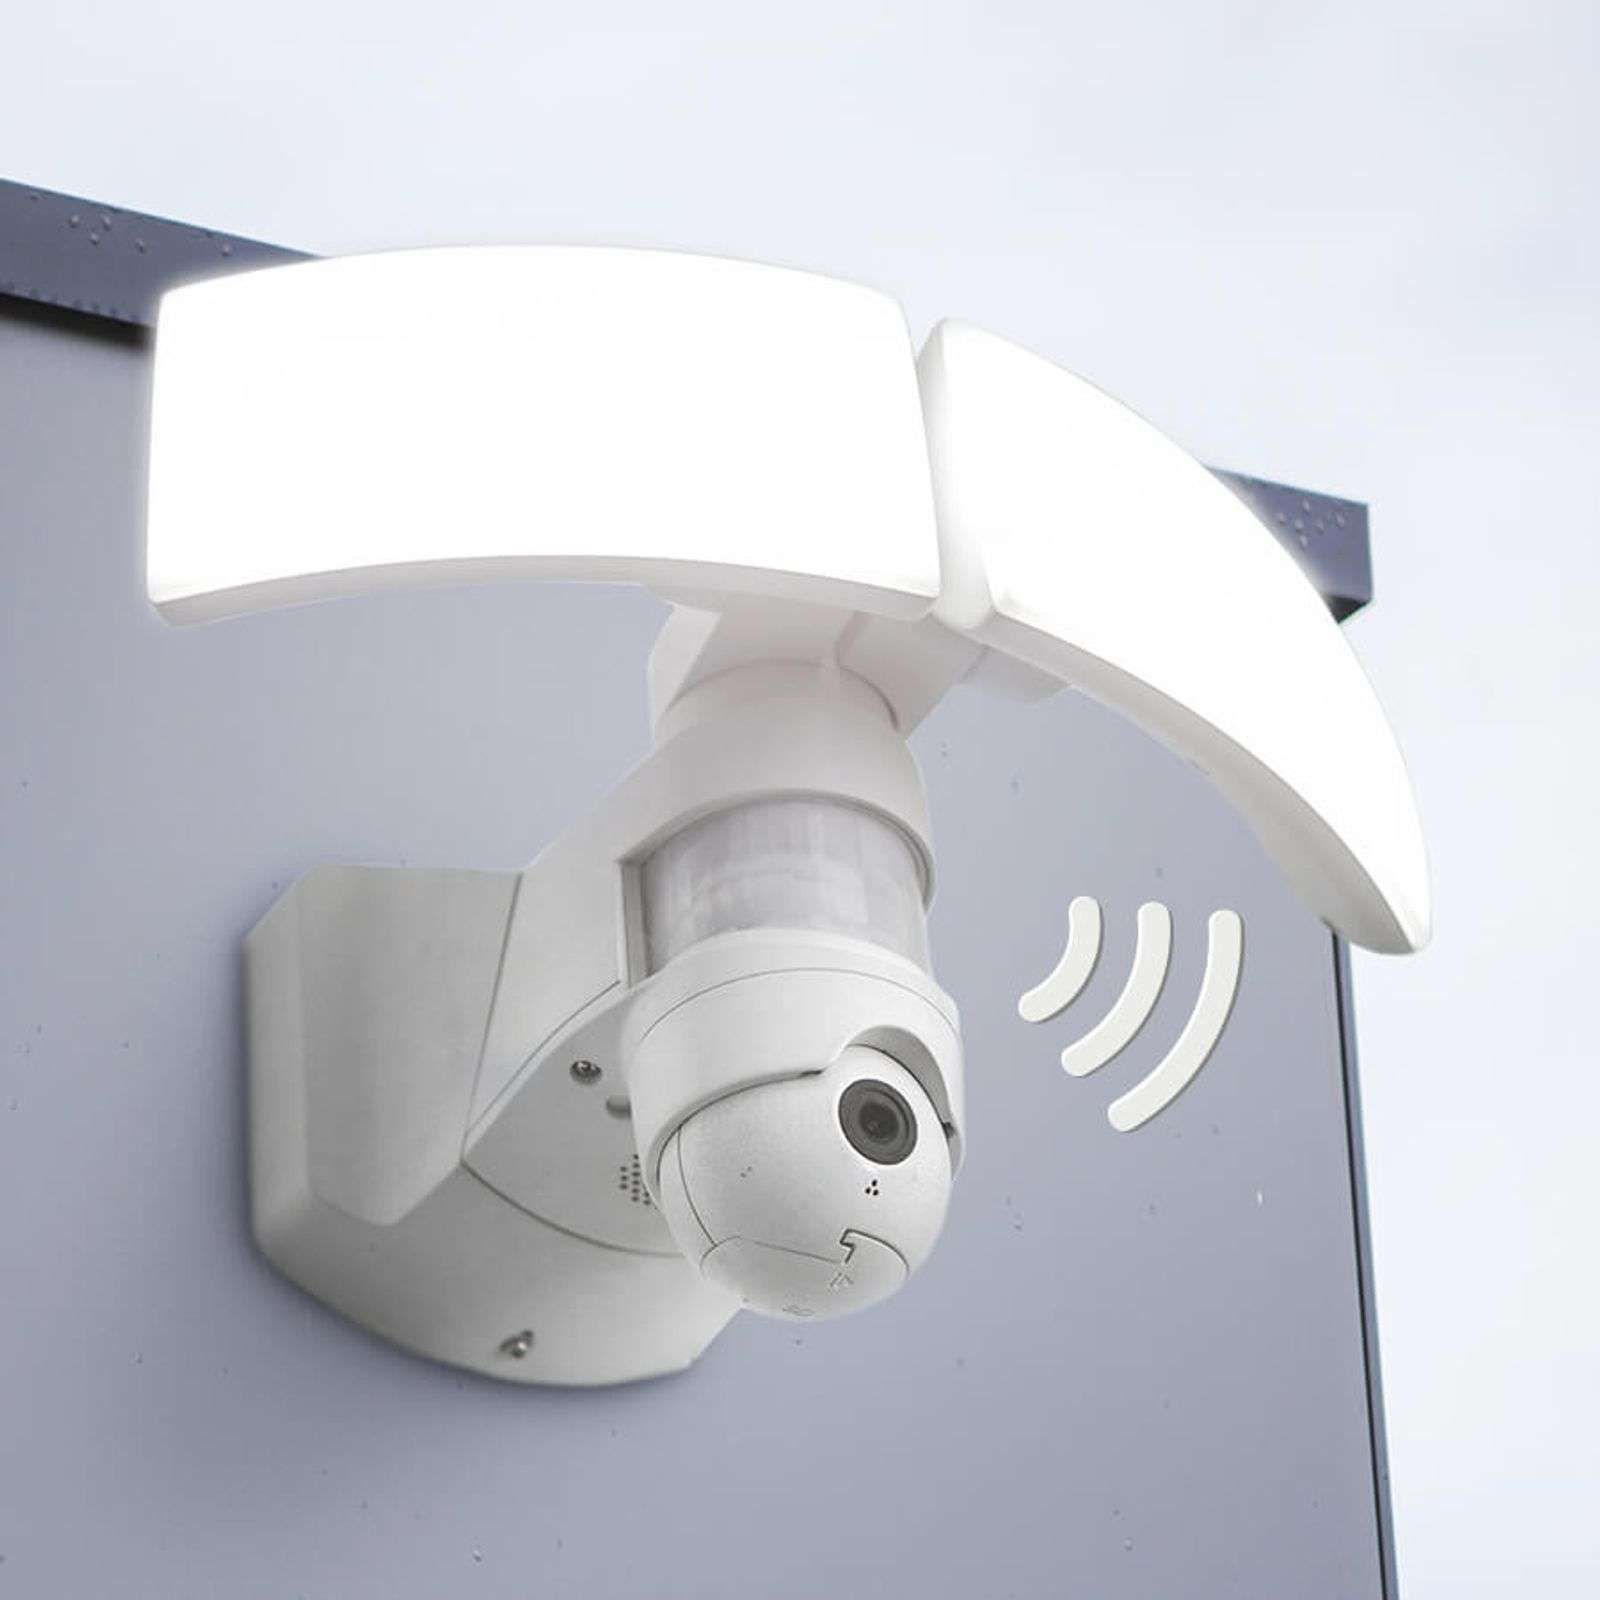 Secury Light Libra Led Aussenwandleuchte Mit Kamera In 2020 Led Bewegungsmelder Led Aussenwandleuchte